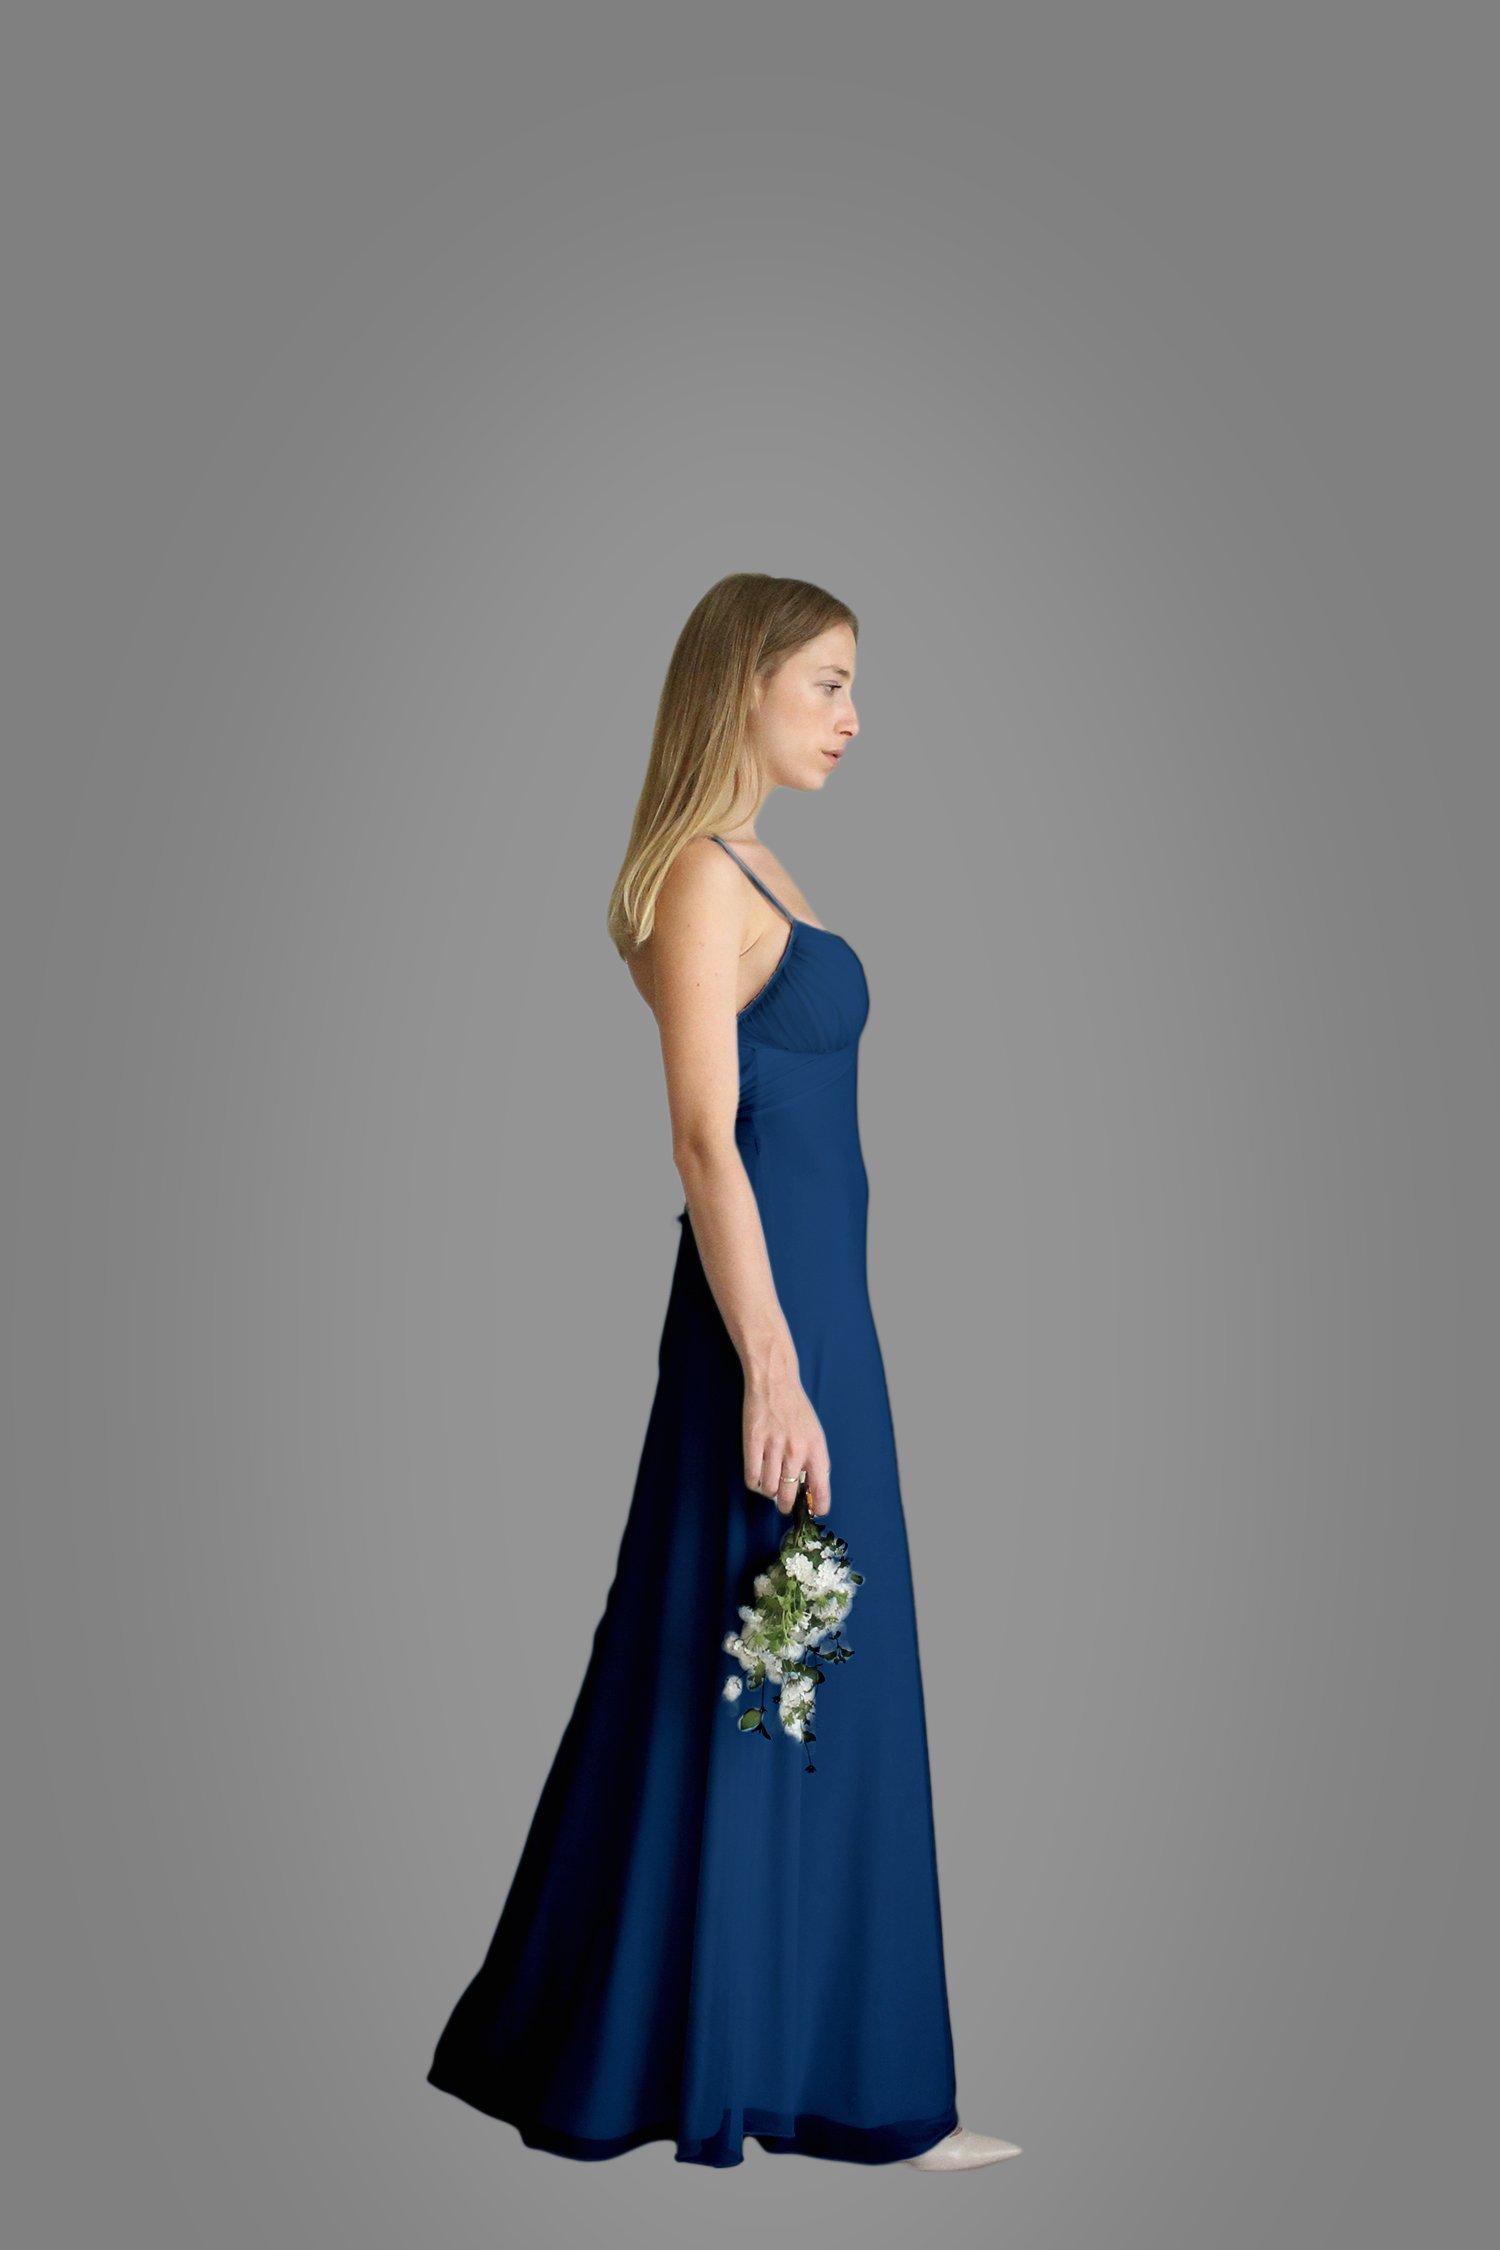 Women's Dress, Navy Blue Bridesmaid Evening Dress, Size S, Maxi Long Dress for Wedding, Chiffon Lycra Classic Gown